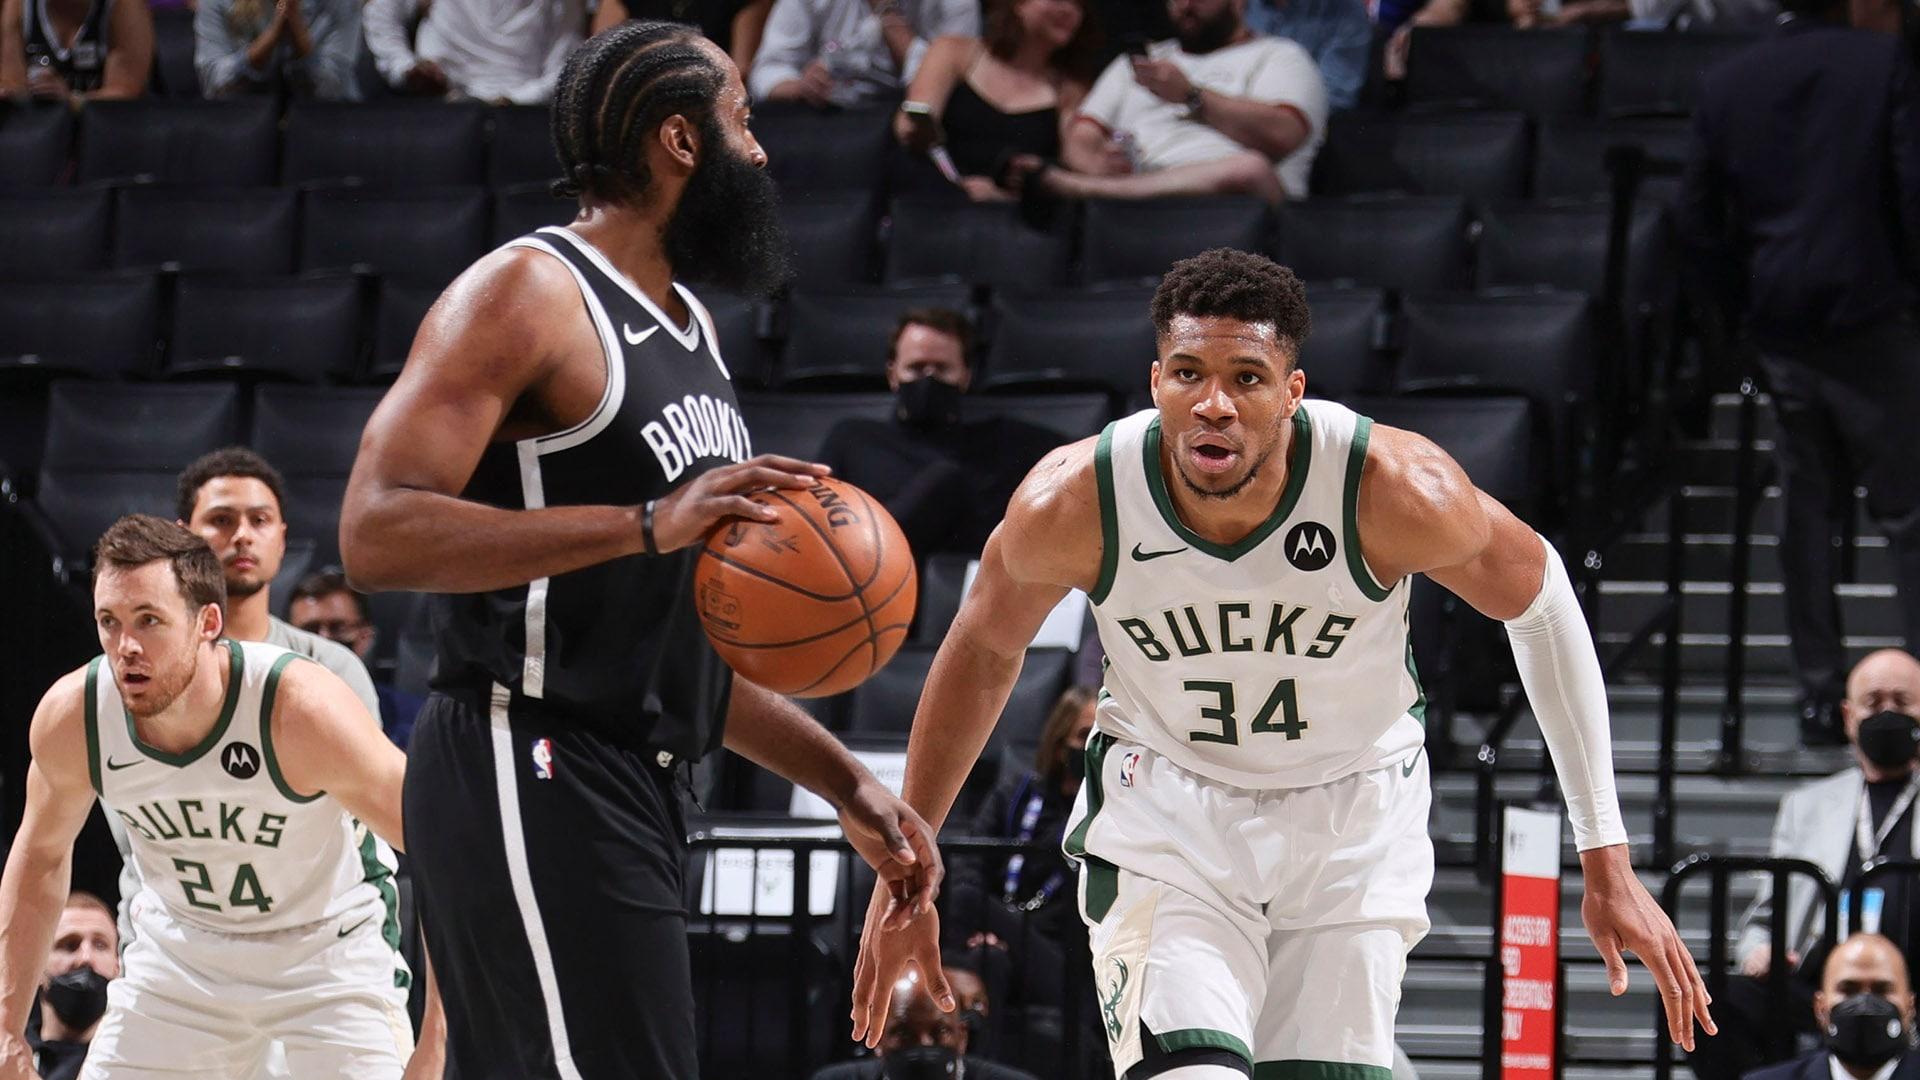 Offseason Power Rankings: Nets, Bucks stand tall in the East